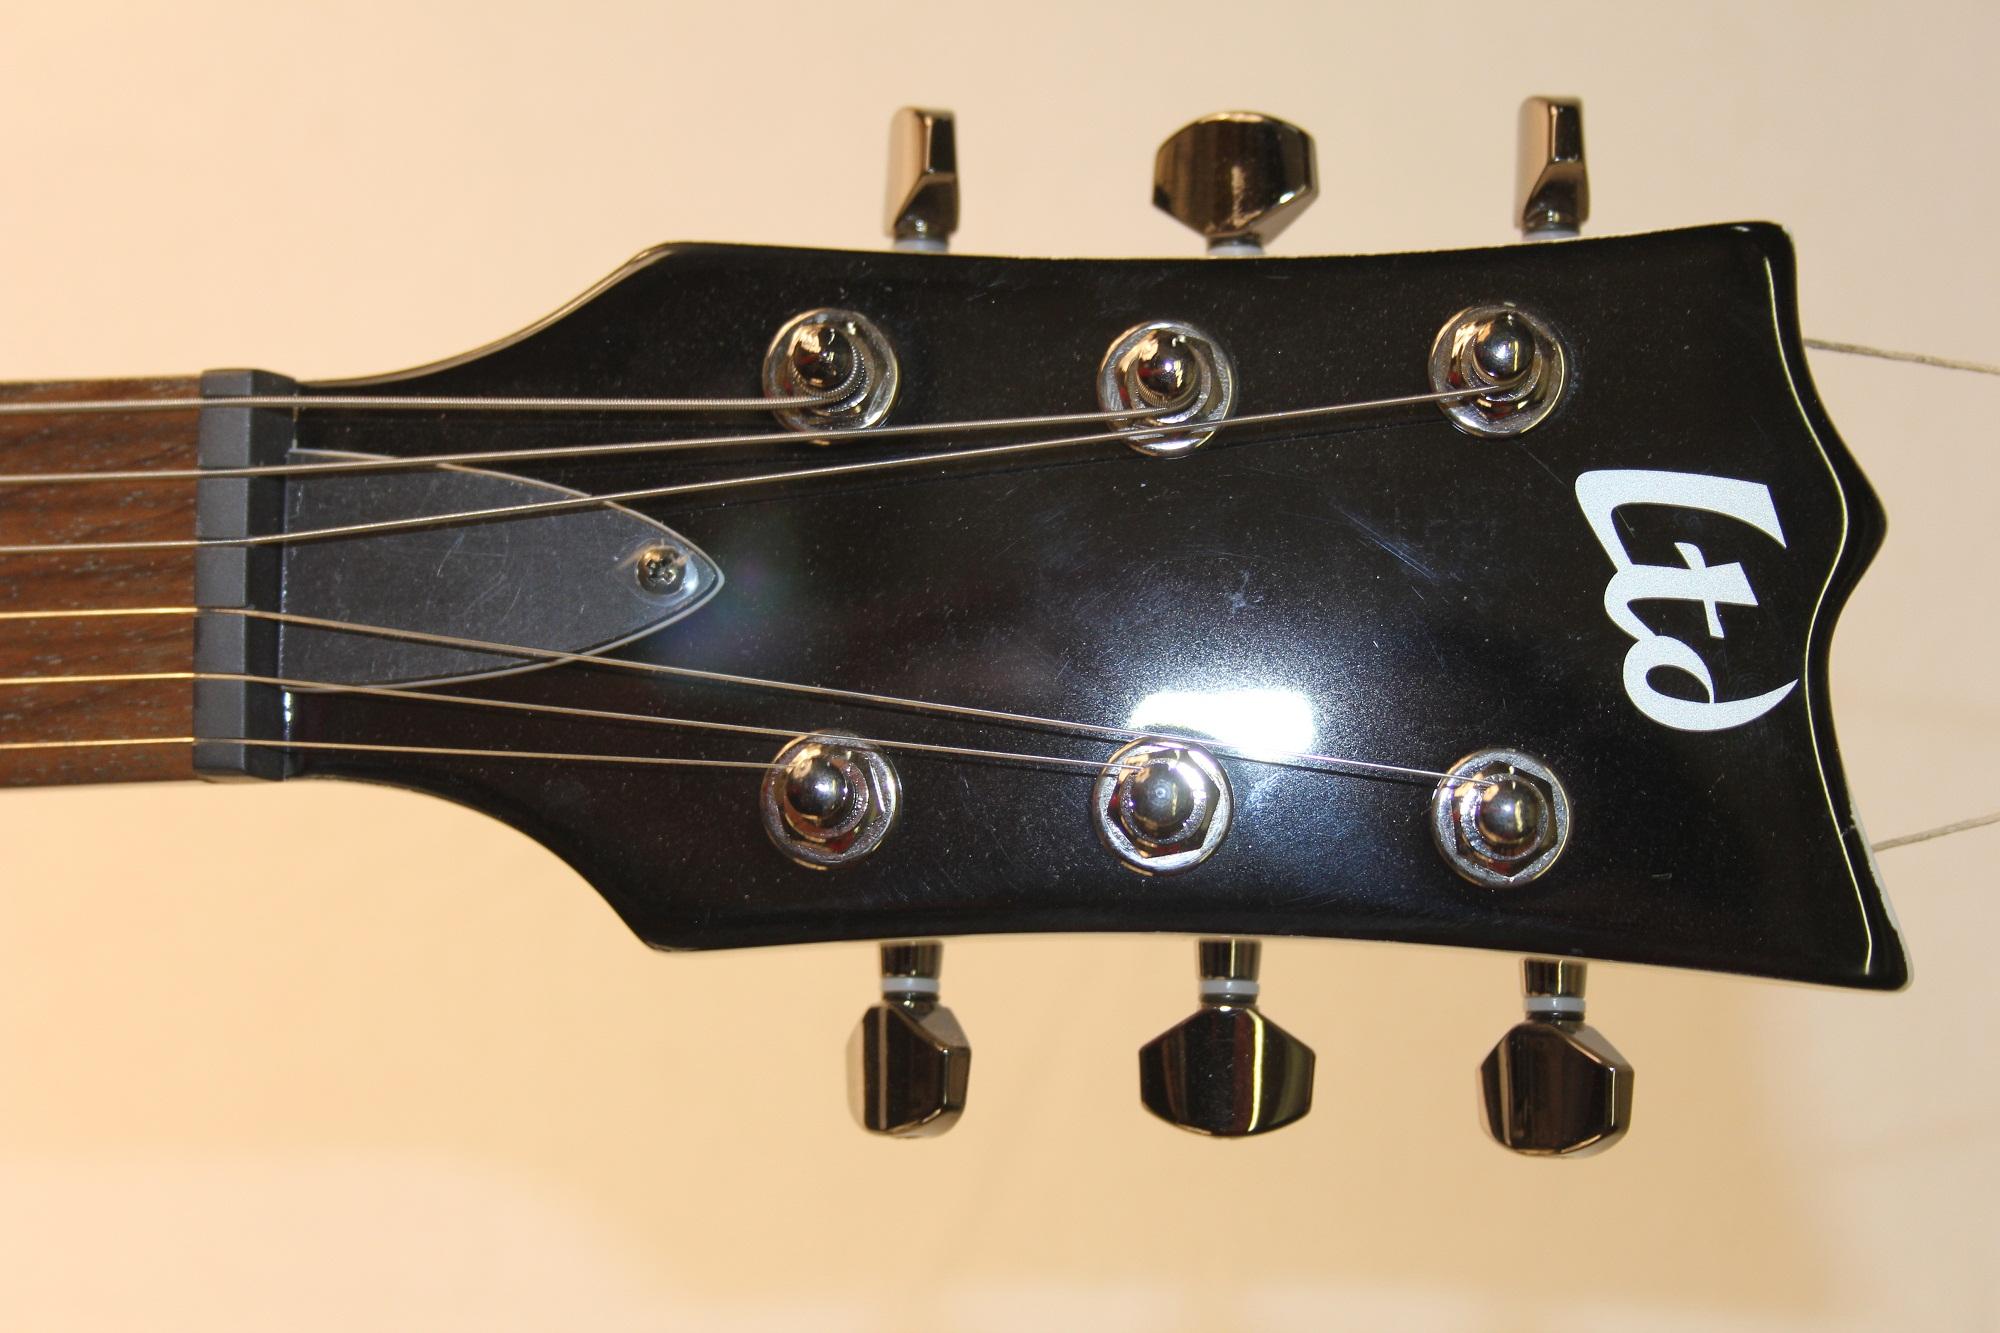 esp ltd viper 50 affliction sample prototype electric guitar 6. Black Bedroom Furniture Sets. Home Design Ideas